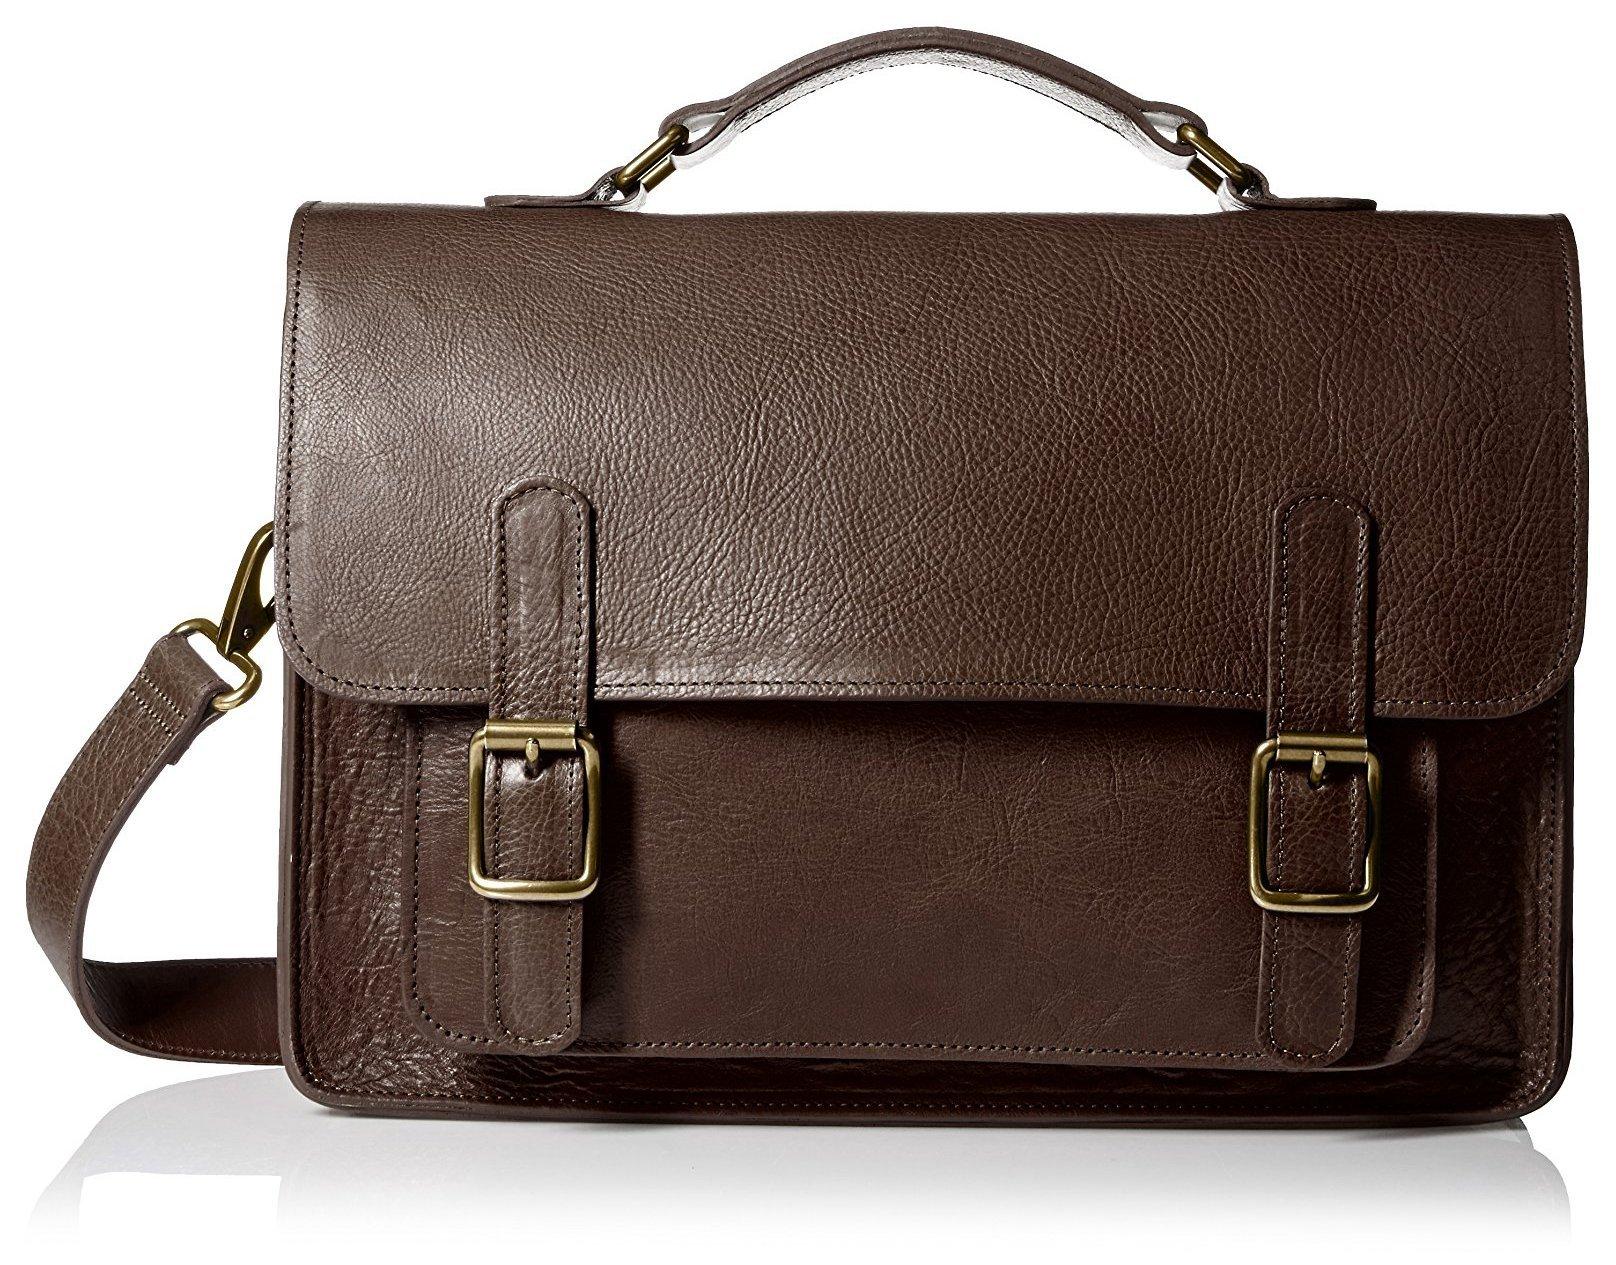 The British Belt Co. Men's Kingston Satchel, Chestnut Brown/Orange